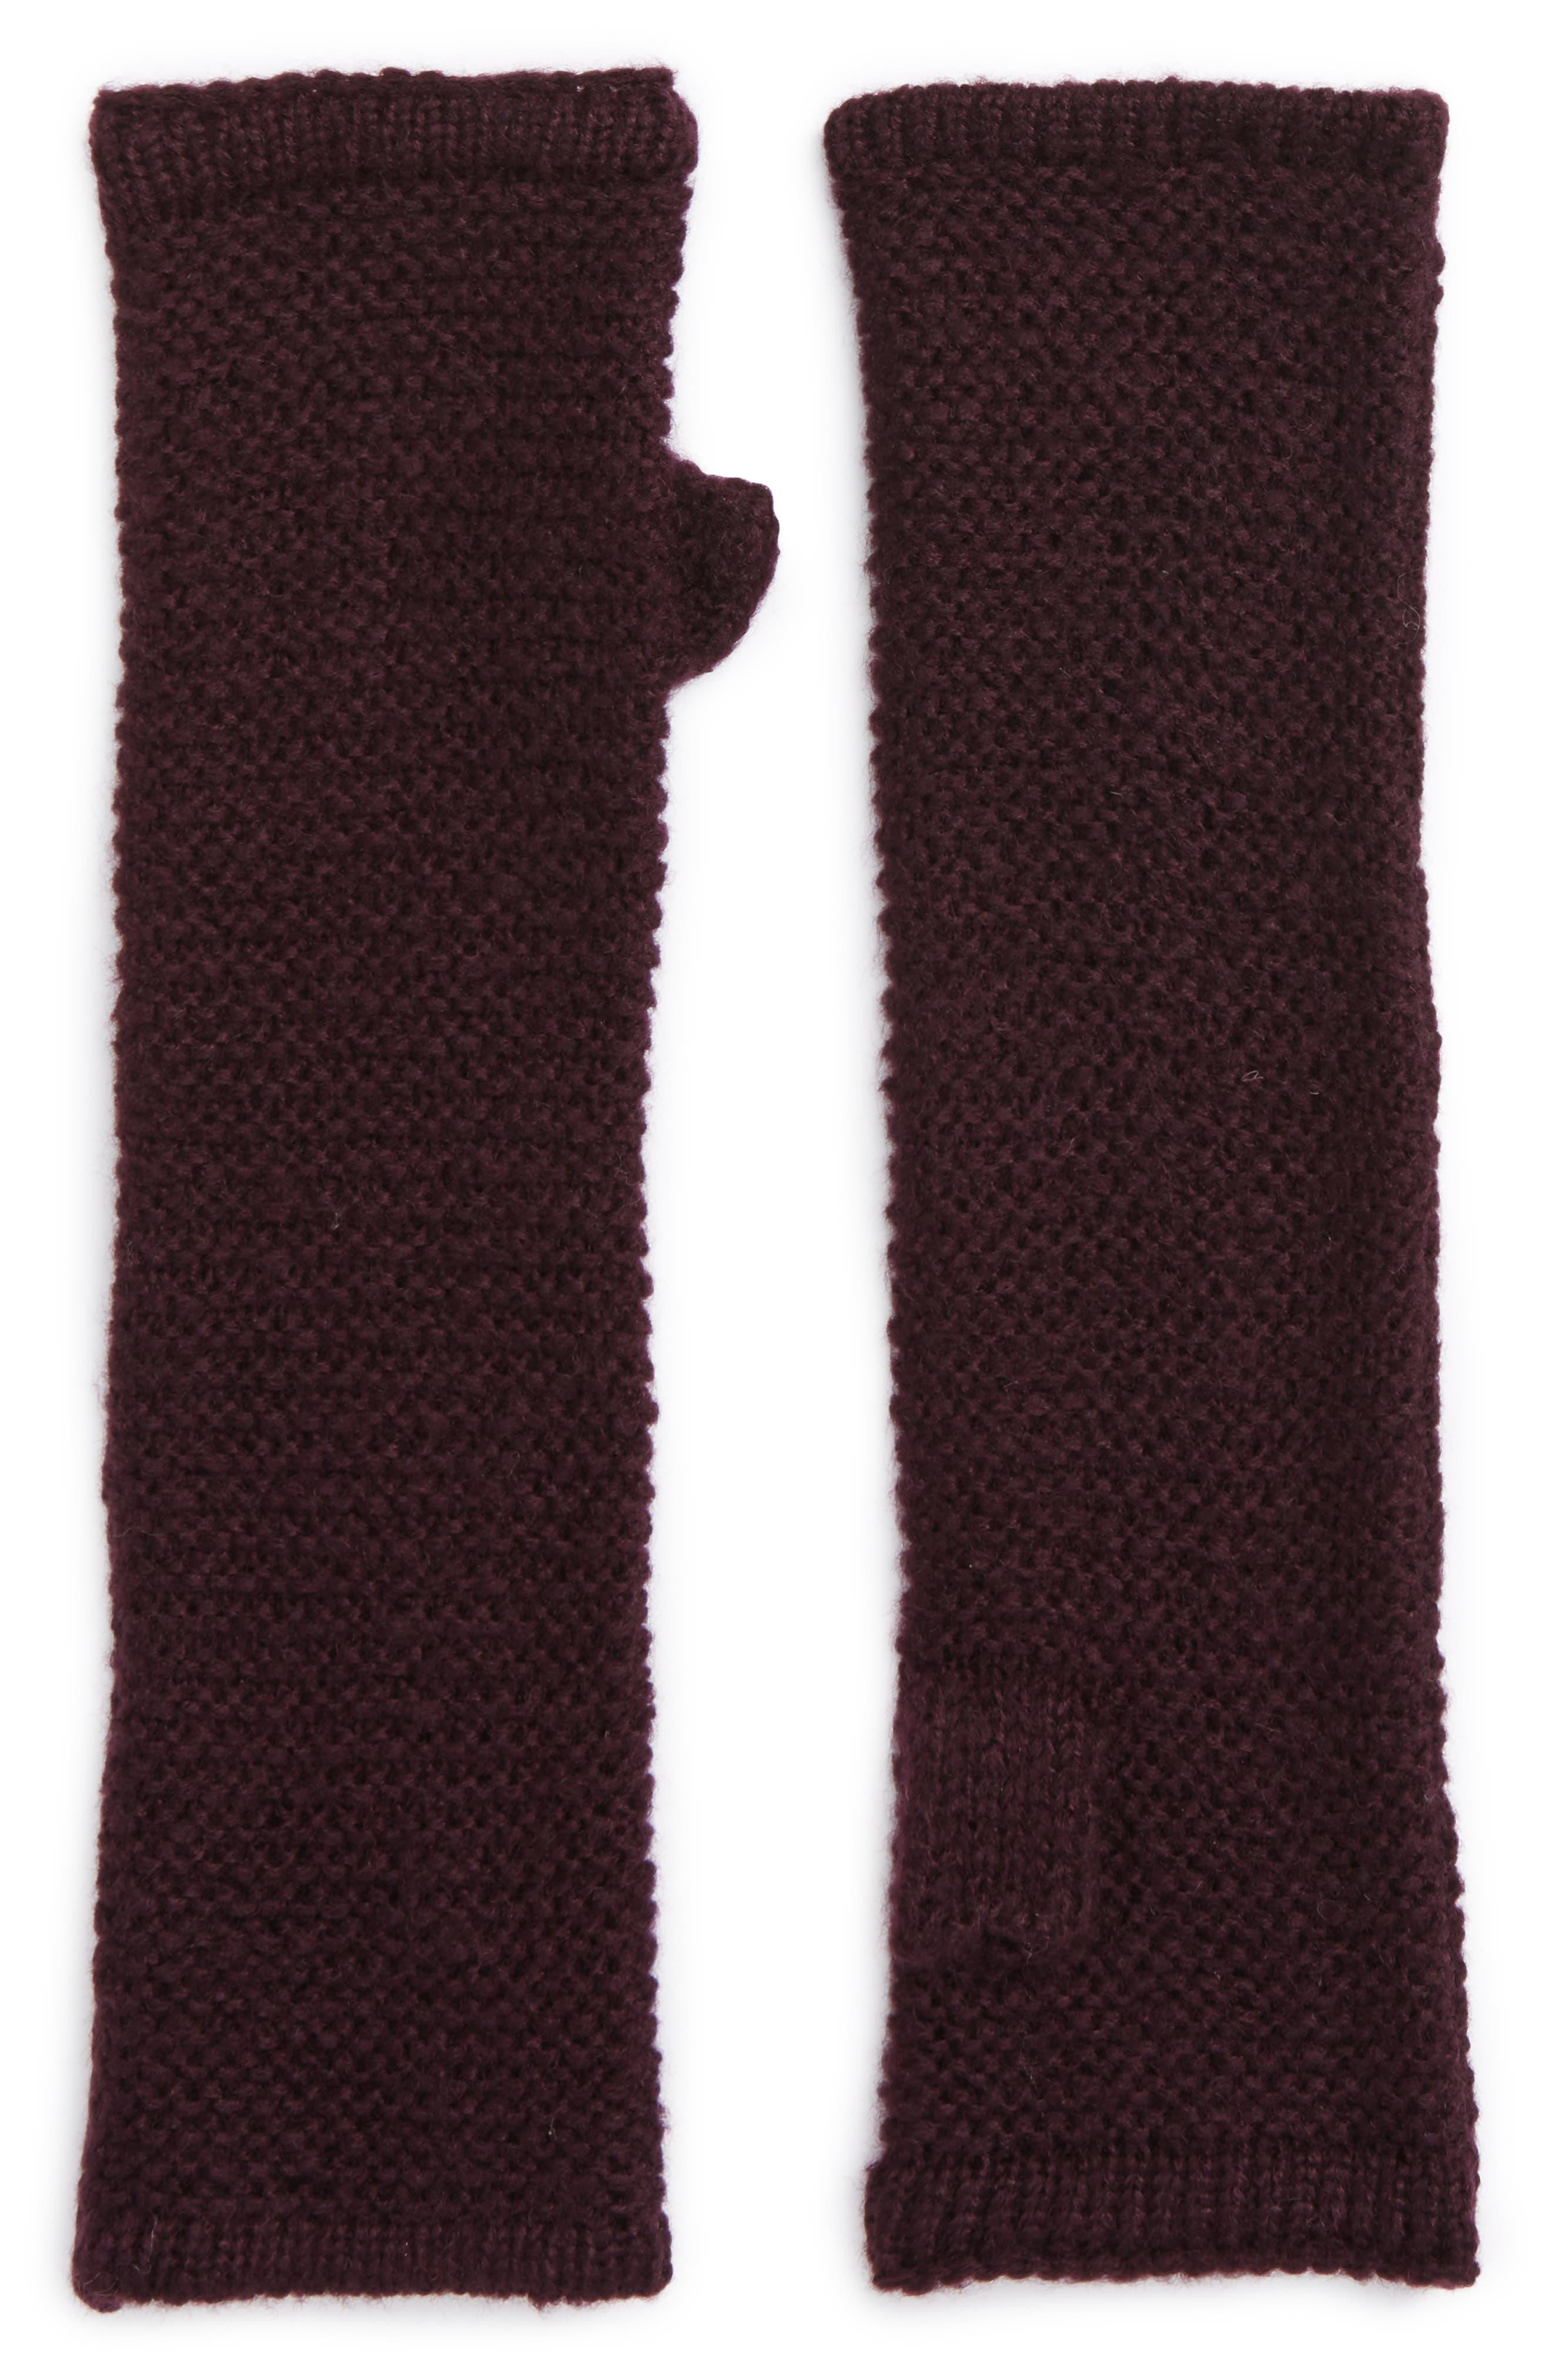 Garter Stitch Fingerless Gloves,                             Main thumbnail 1, color,                             Deep Eggplant